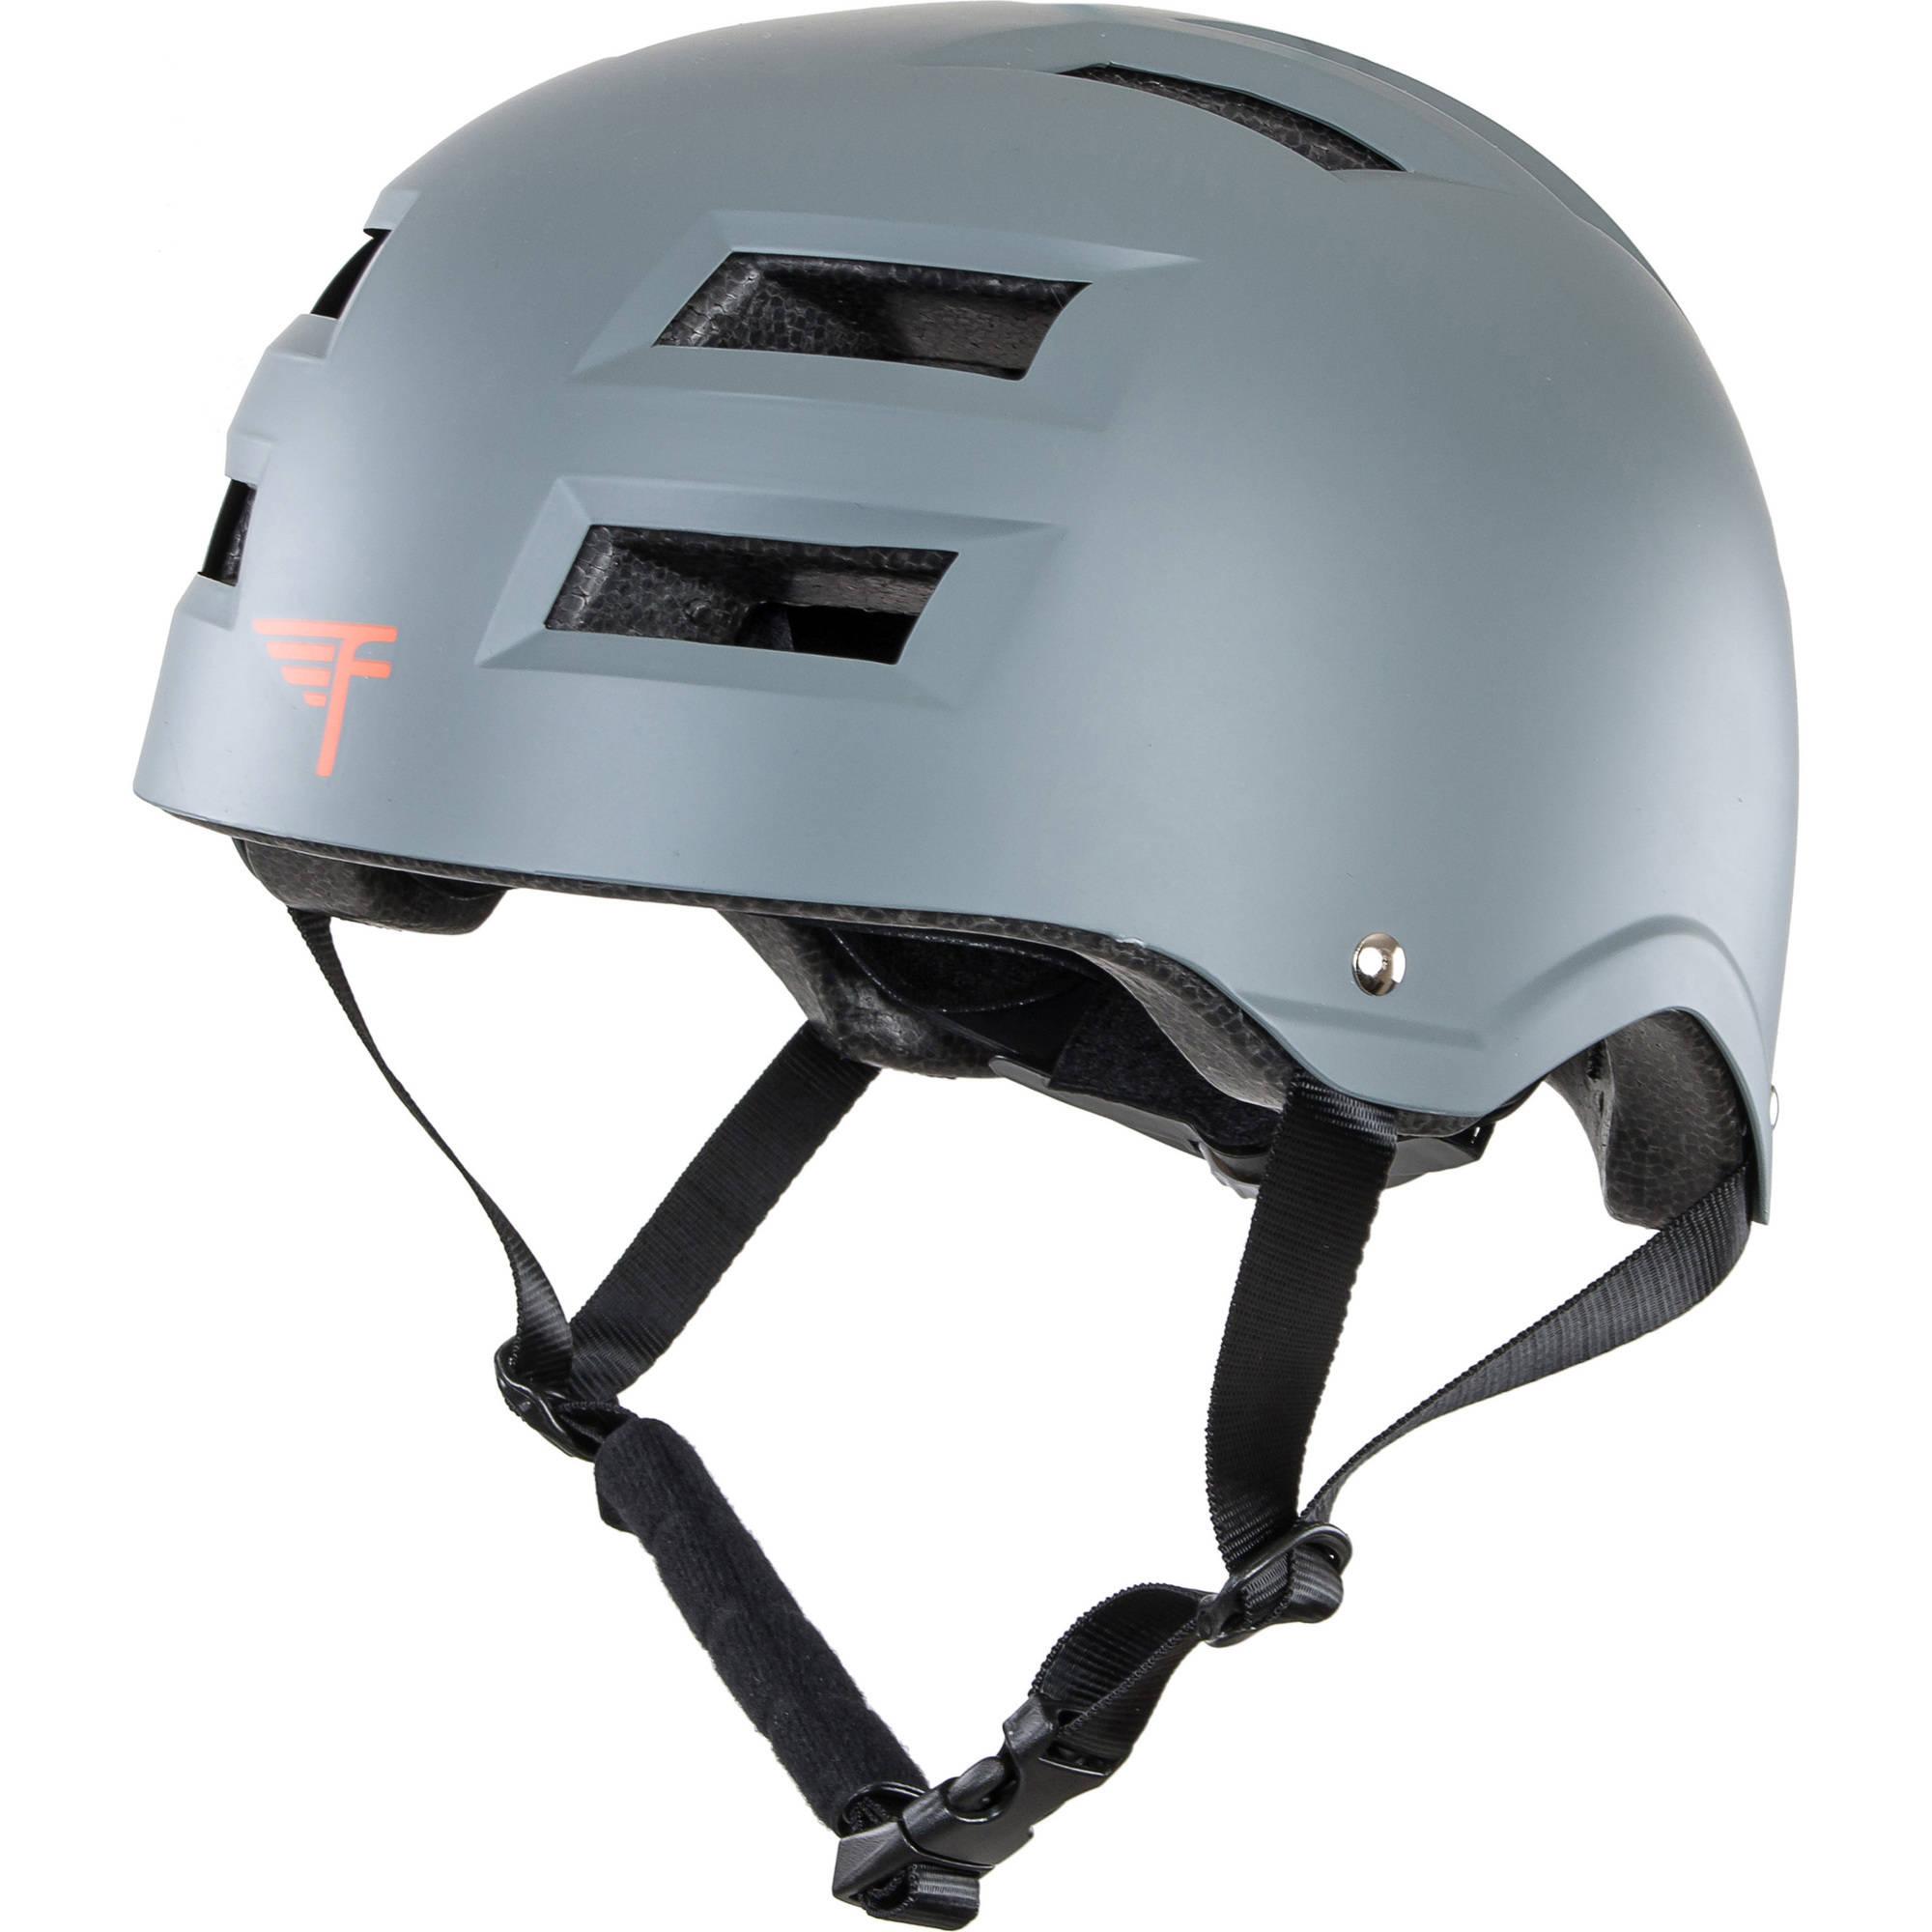 Flybar Multi Sport Helmet, Grey, M/L